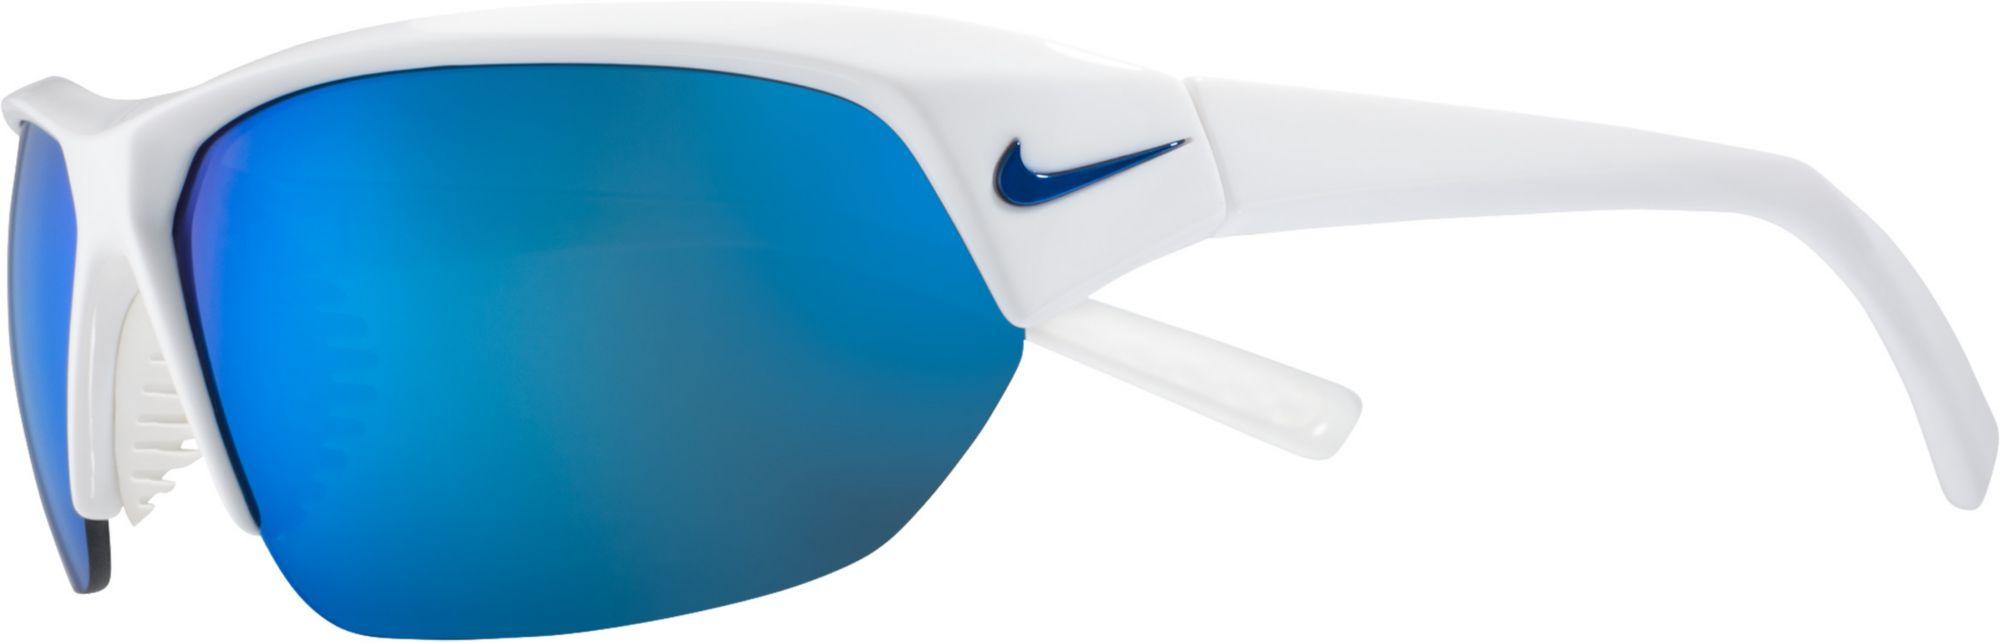 Best Sunglasses in Golf - Nike Skylon Ace